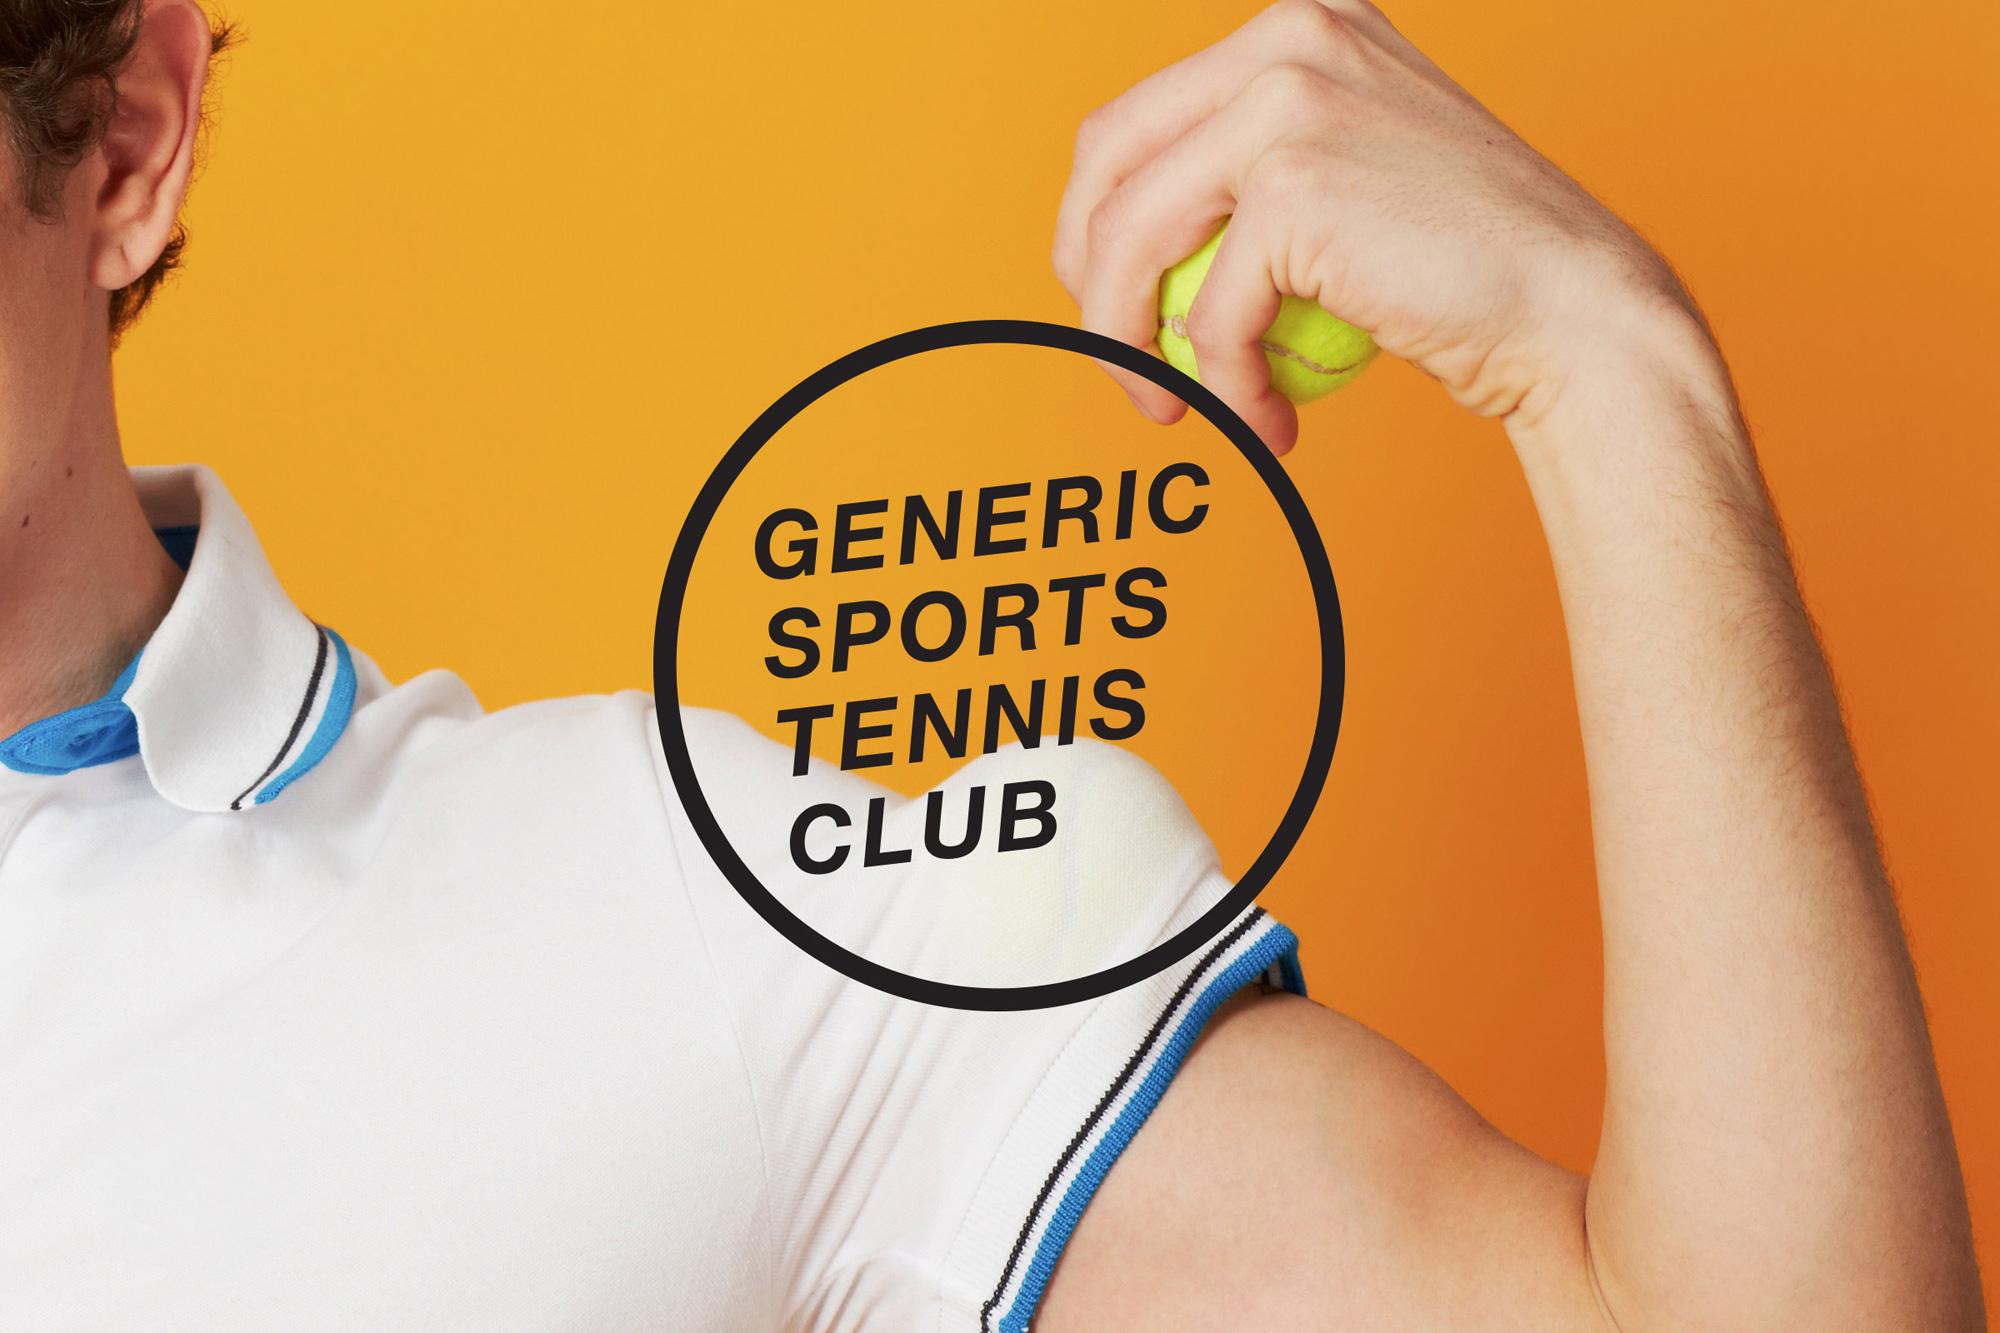 Generic Sports